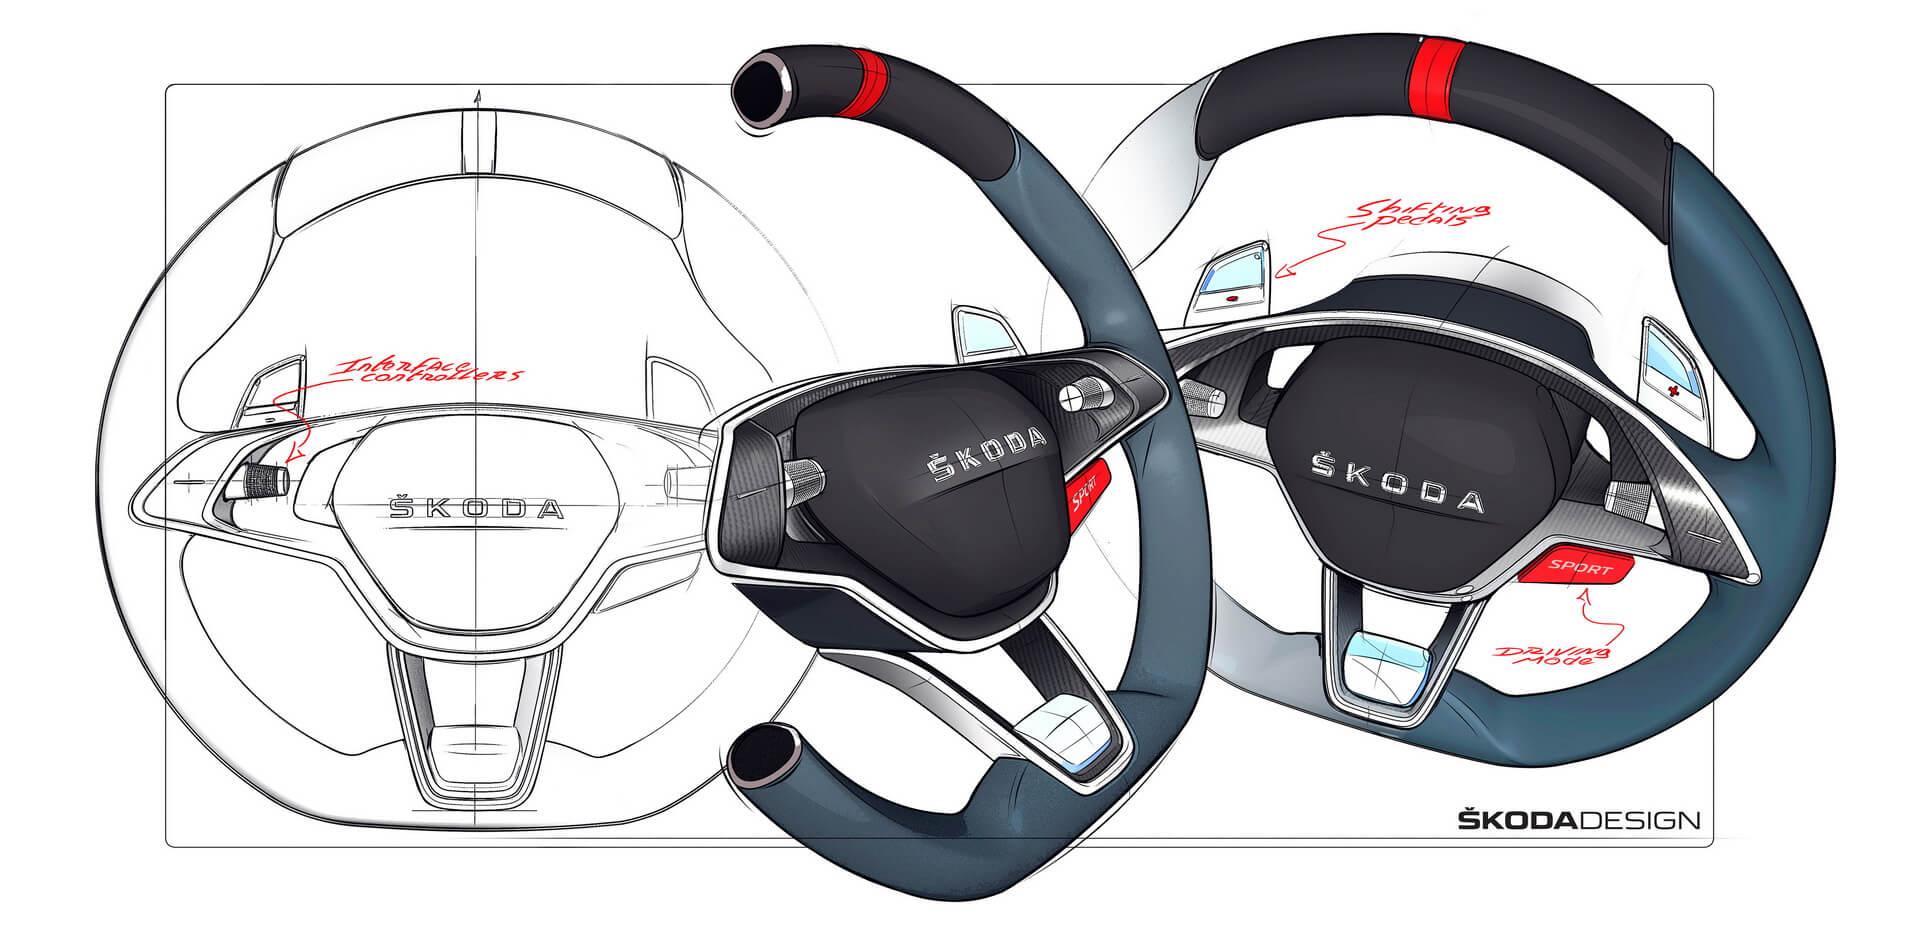 Рулевое колесо плагин-гибрида Škoda Vision RS